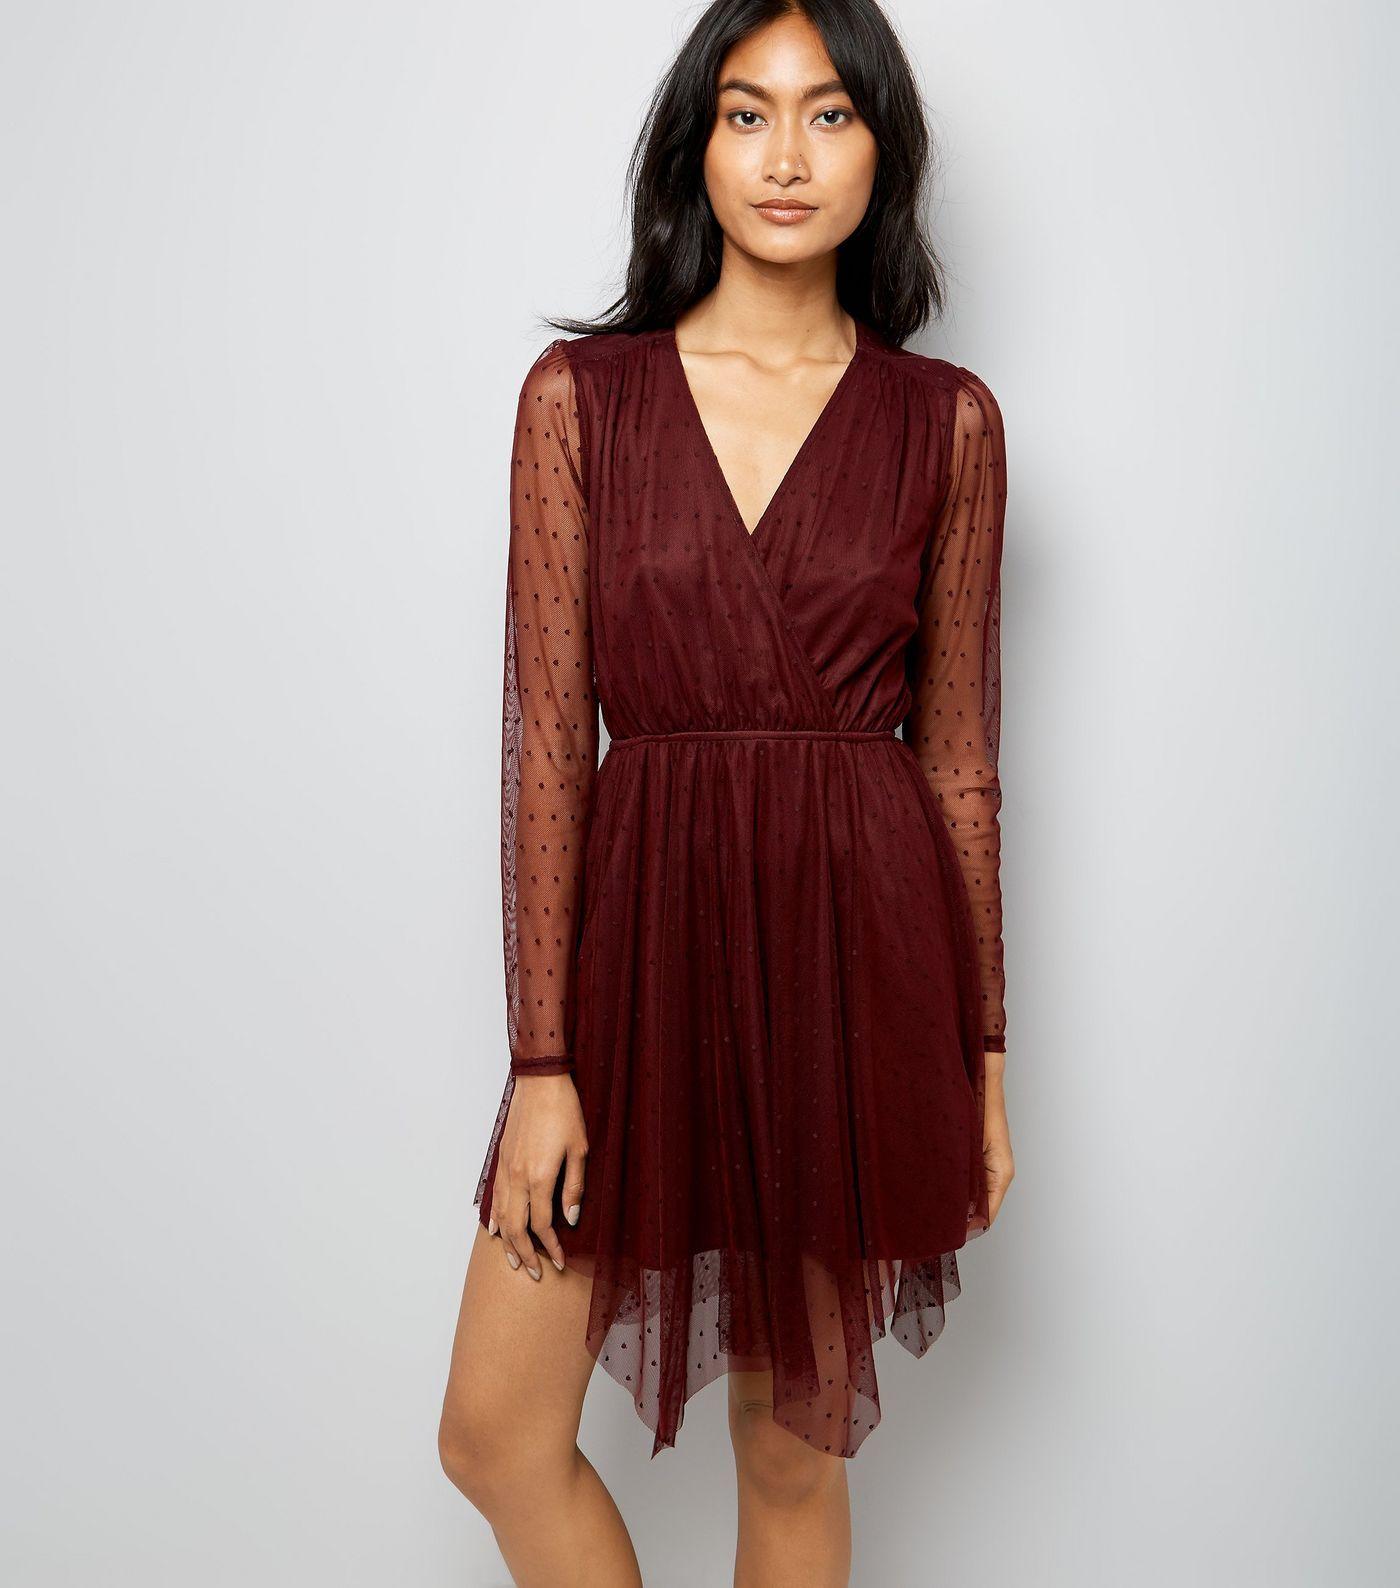 eba66c9b39 Burgundy Spot Mesh Hanky Hem Wrap Front Dress